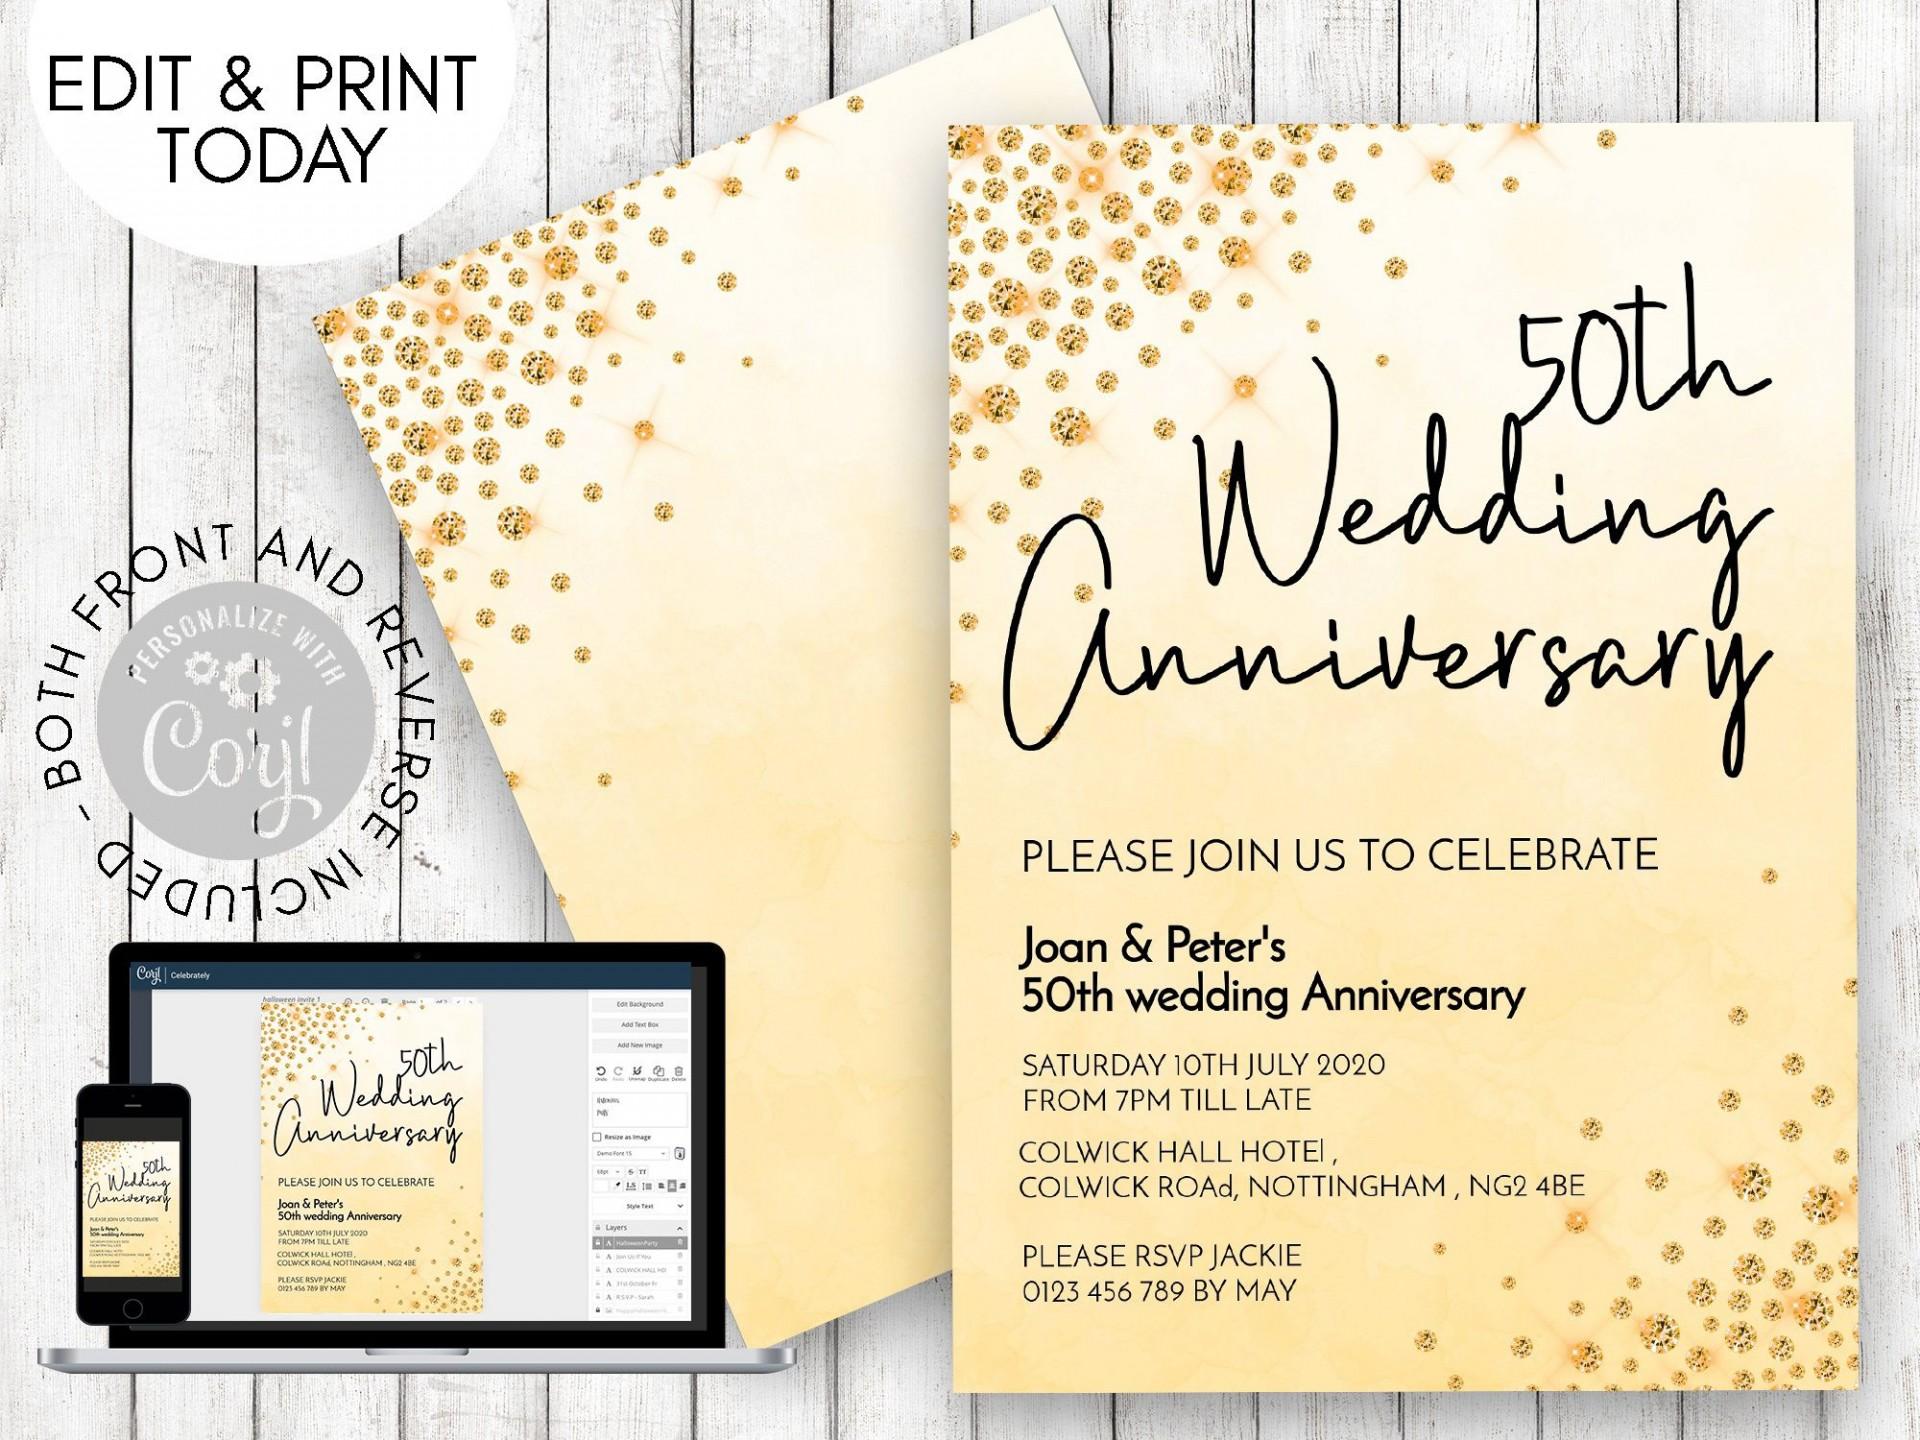 002 Beautiful 50th Anniversary Invitation Template Free High Resolution  Download Golden Wedding1920